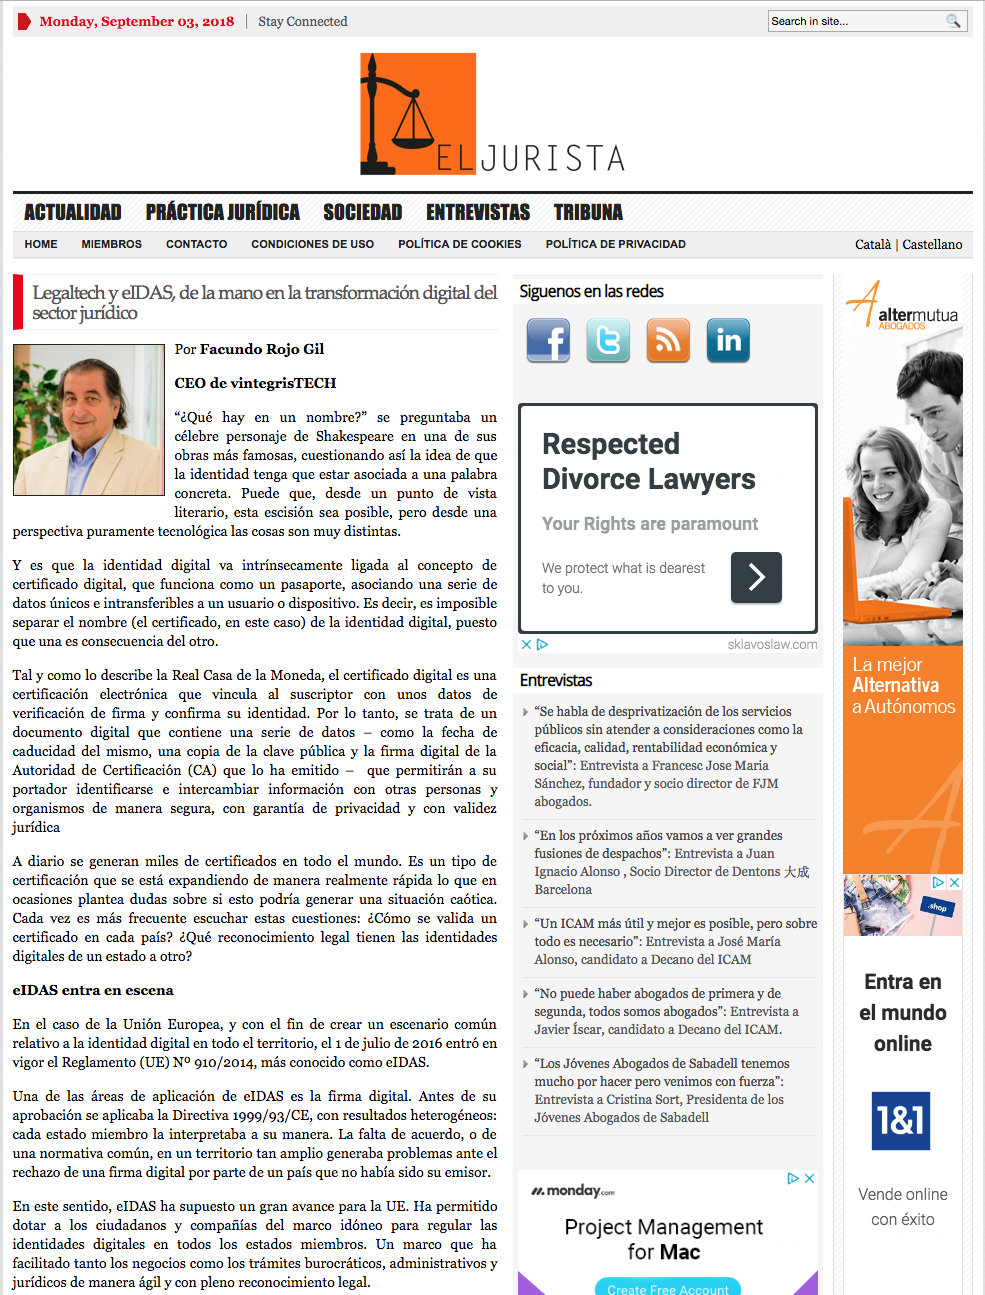 El jurista article_Legaltech an eIDAS